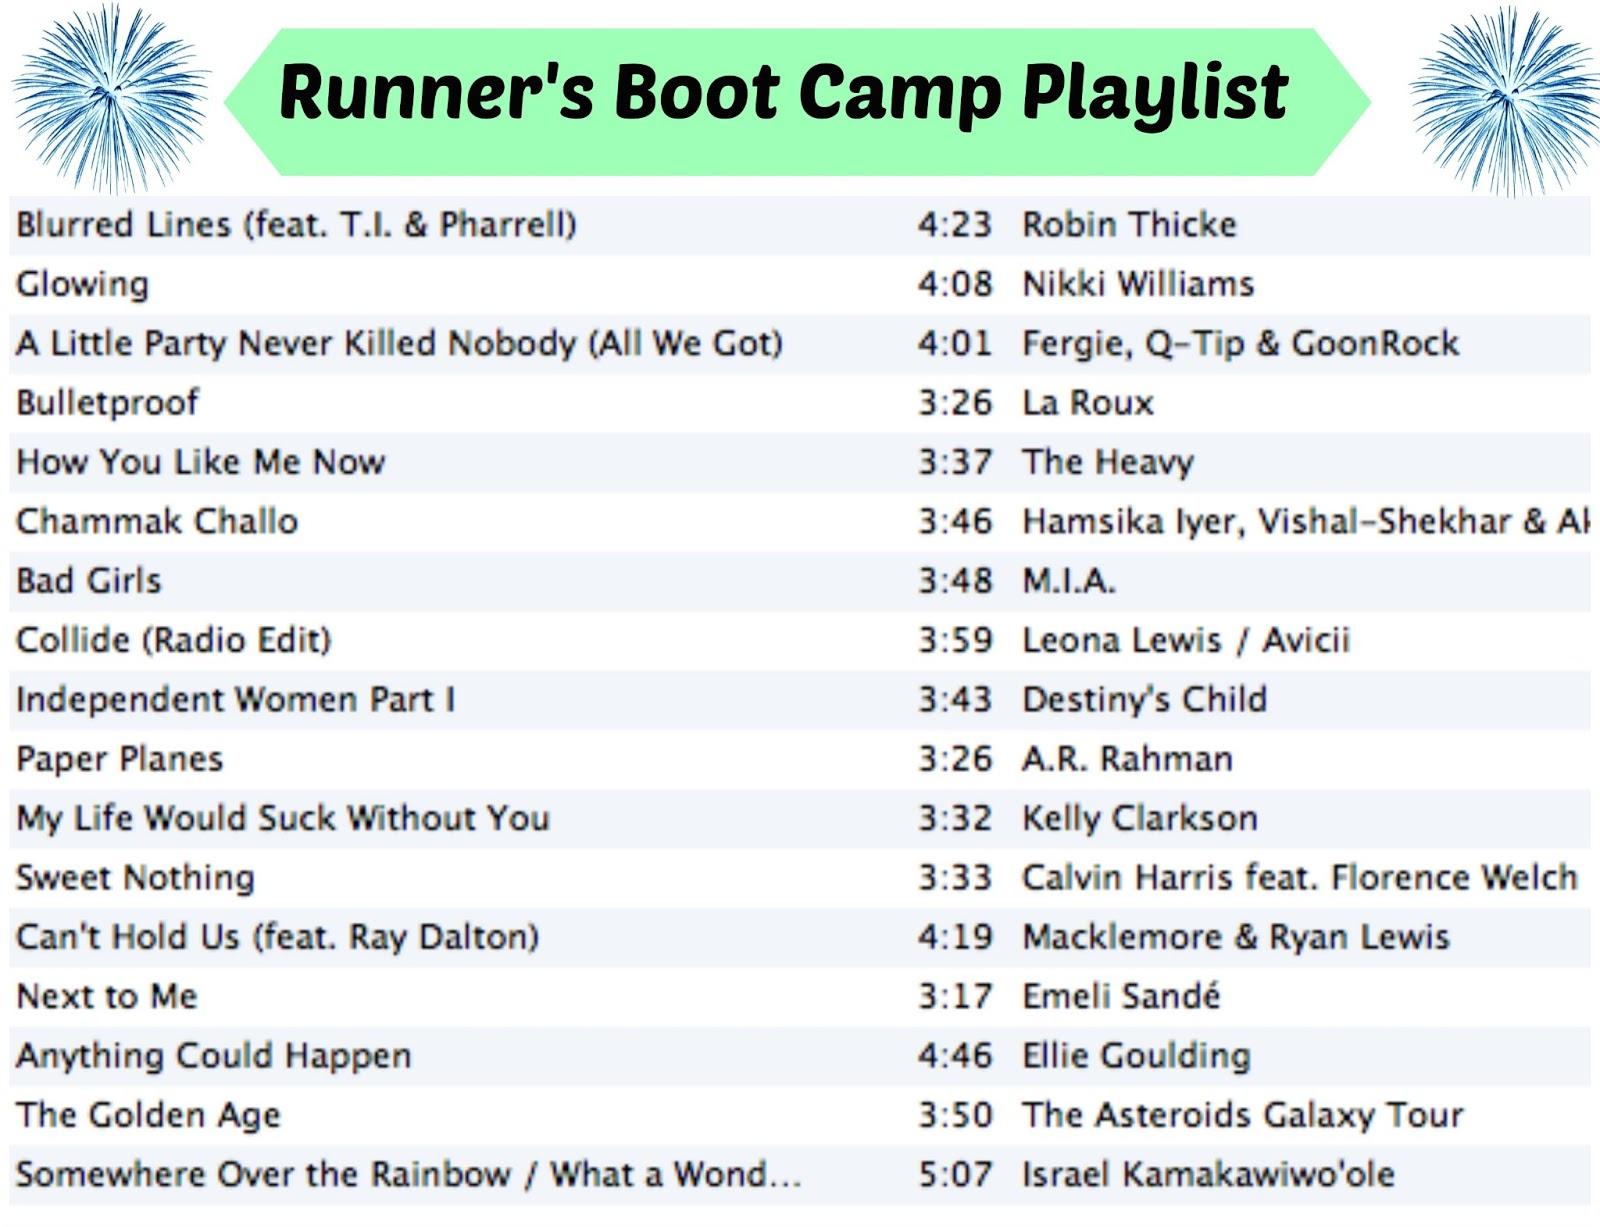 Jen's Best Life: Workout: Runner's Boot Camp